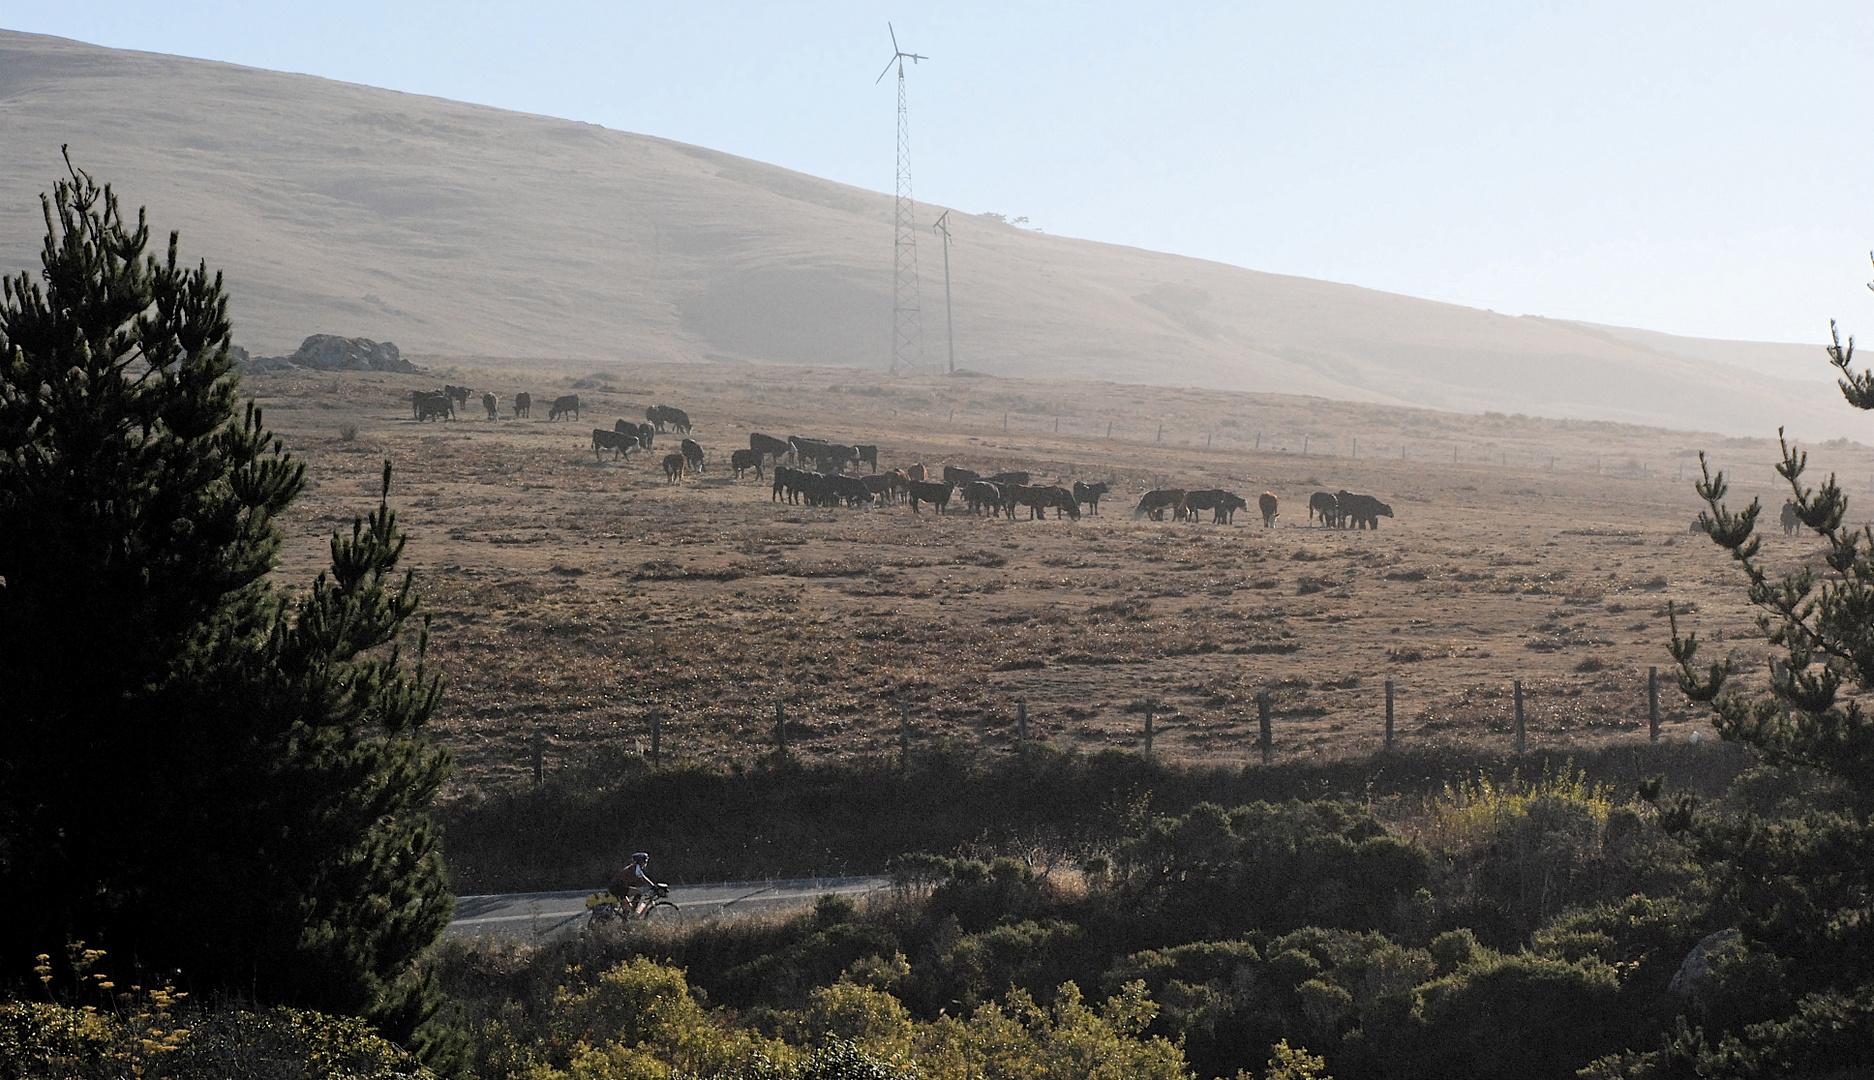 Near Bodega Bay, California